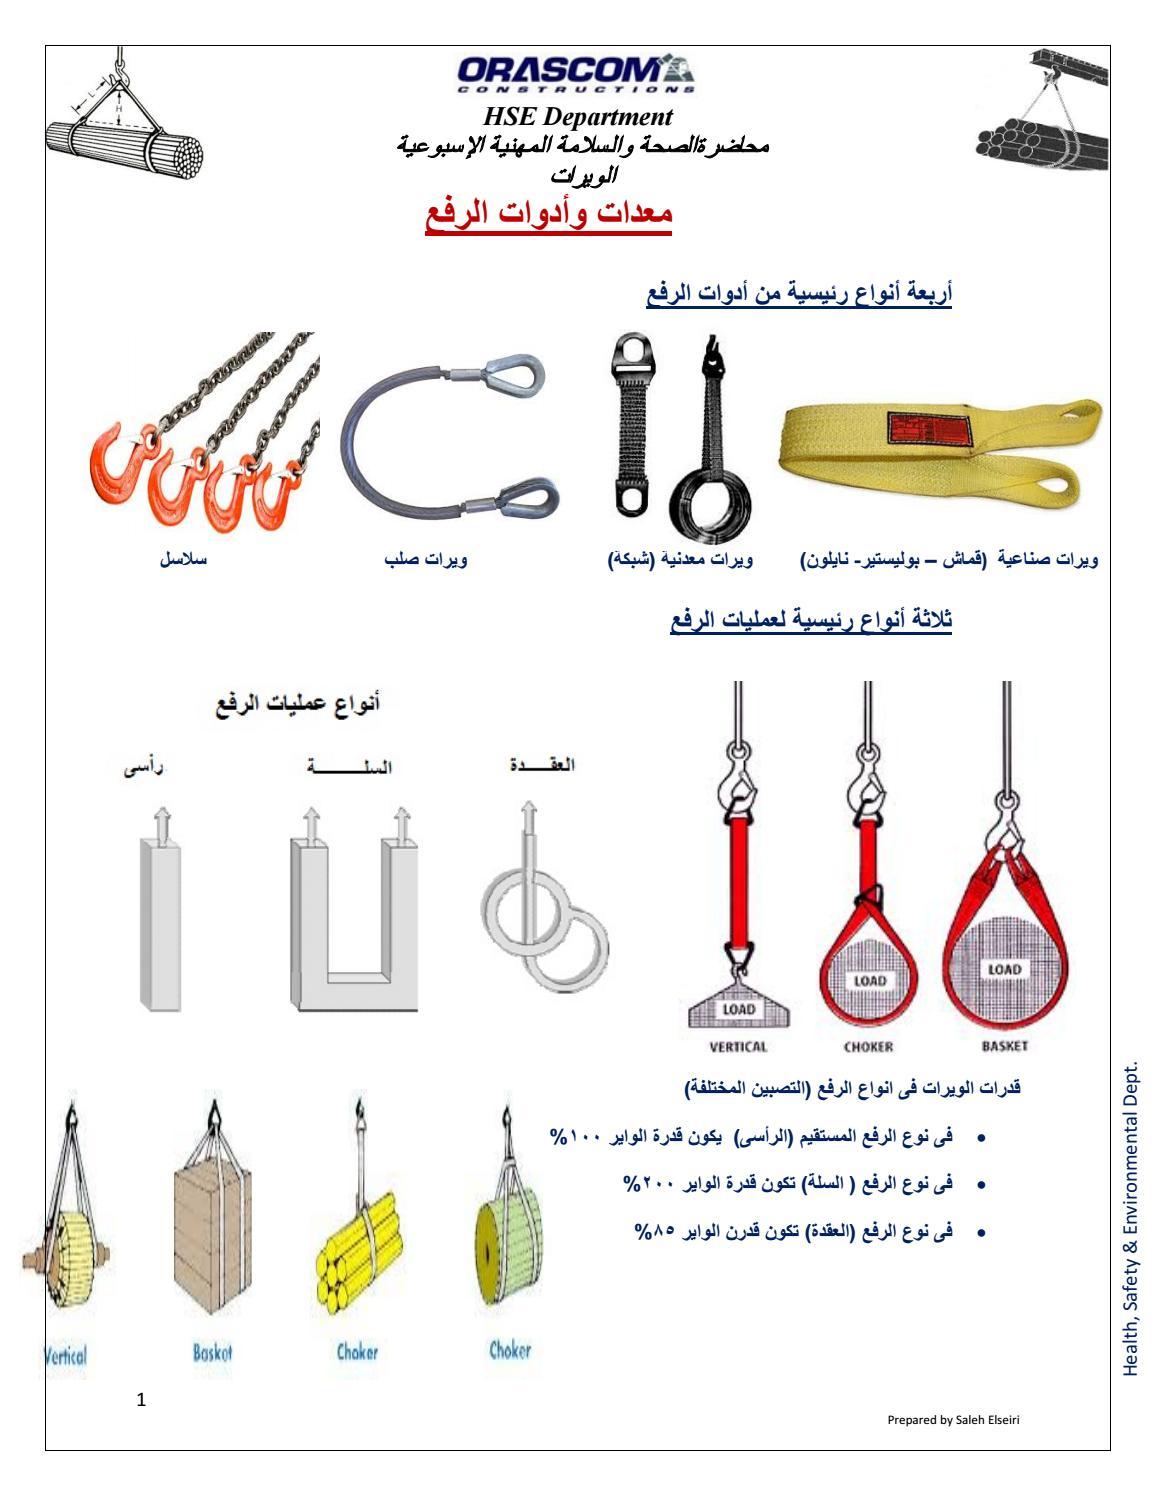 John Deere 445 Wiring Diagram Dolgular – John Deere 111 Wiring Schematic